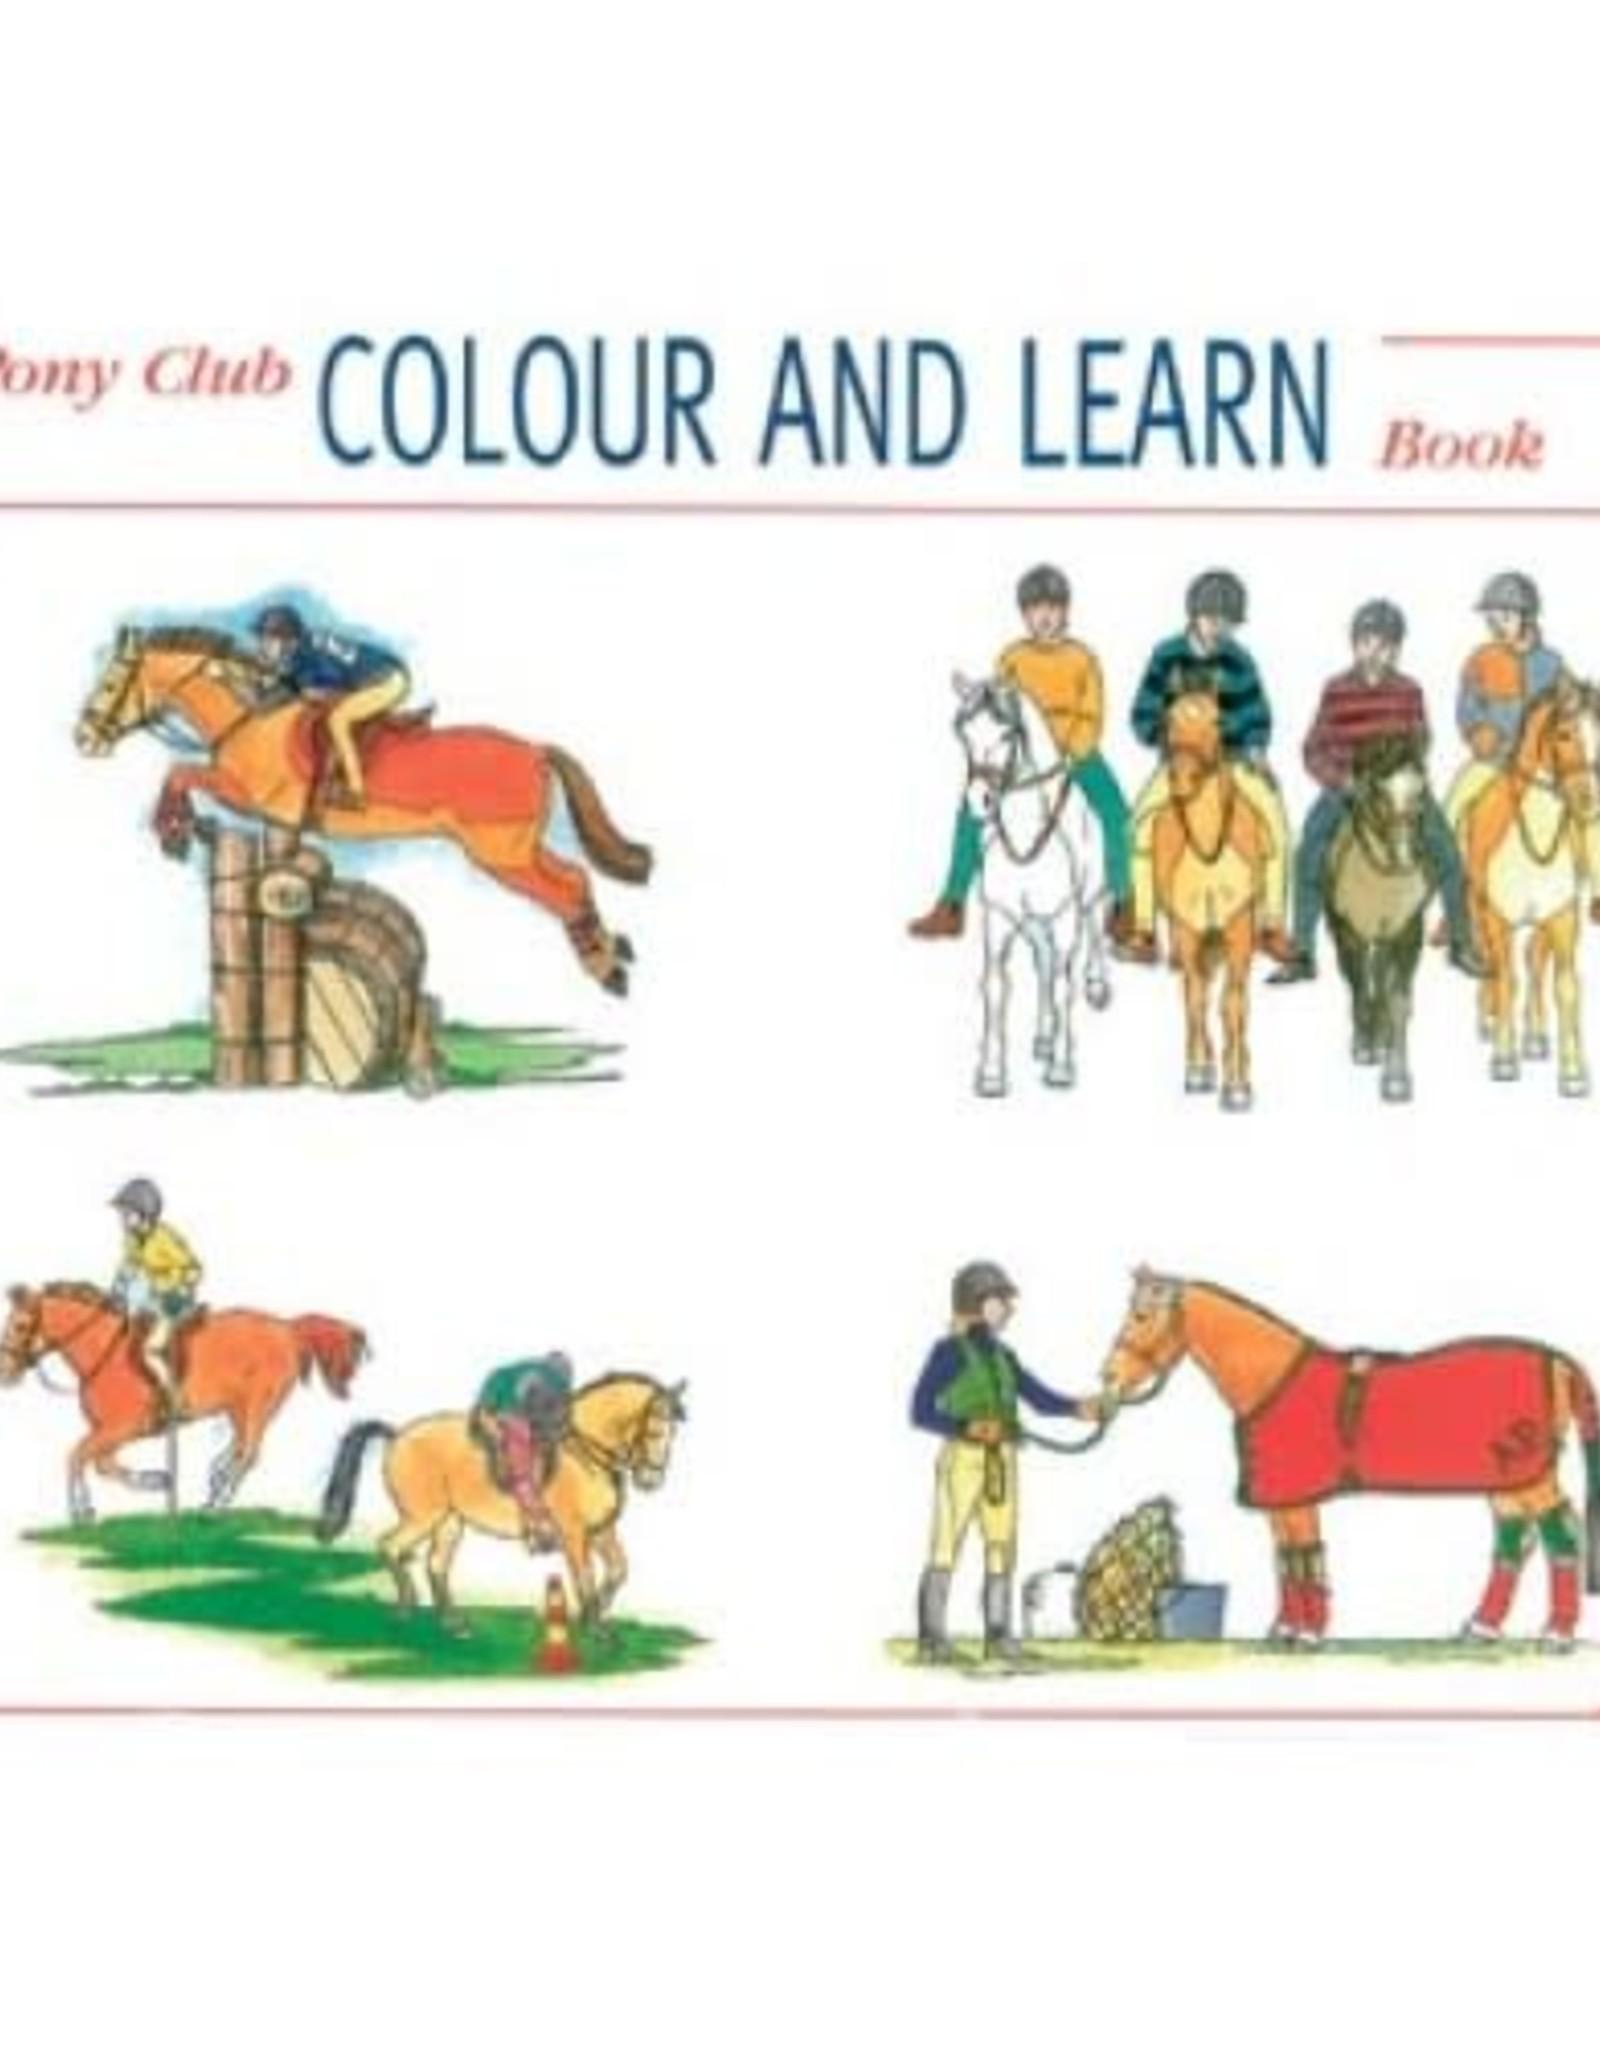 Pony Club Colour & Learn Book